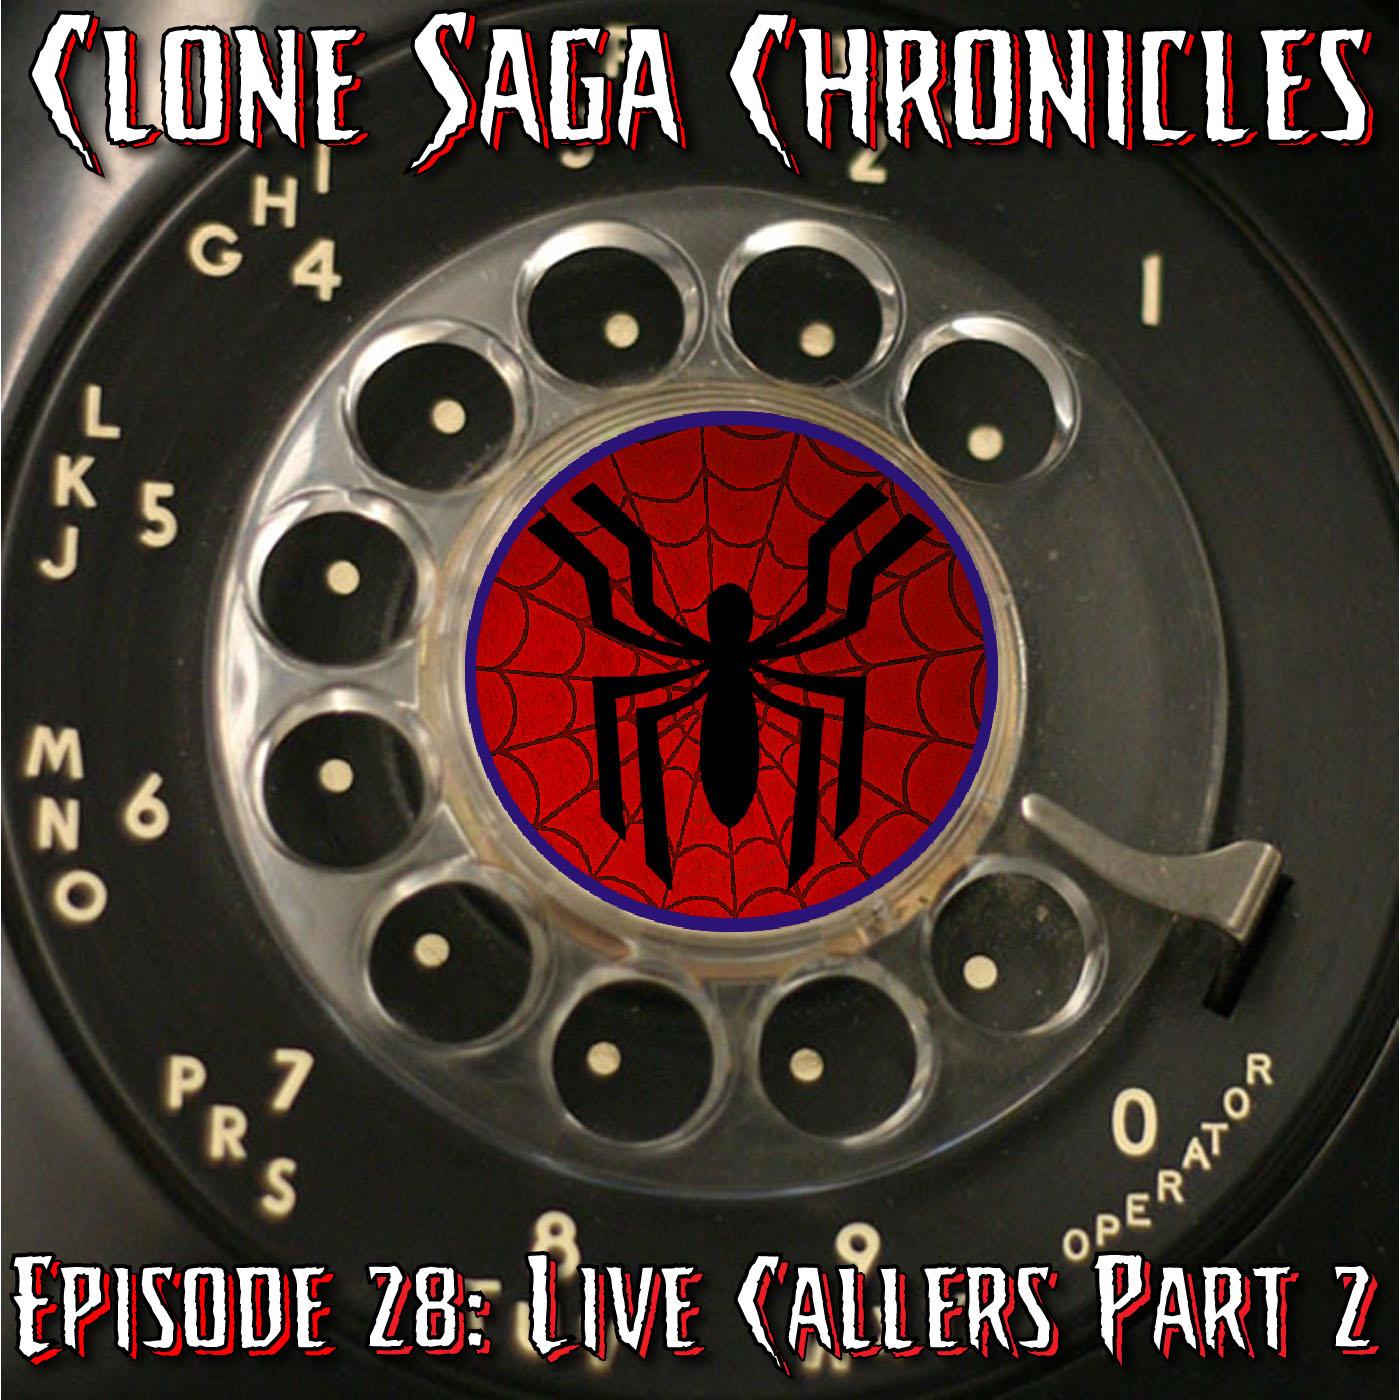 CSC Episode 28: Live Callers Part 2